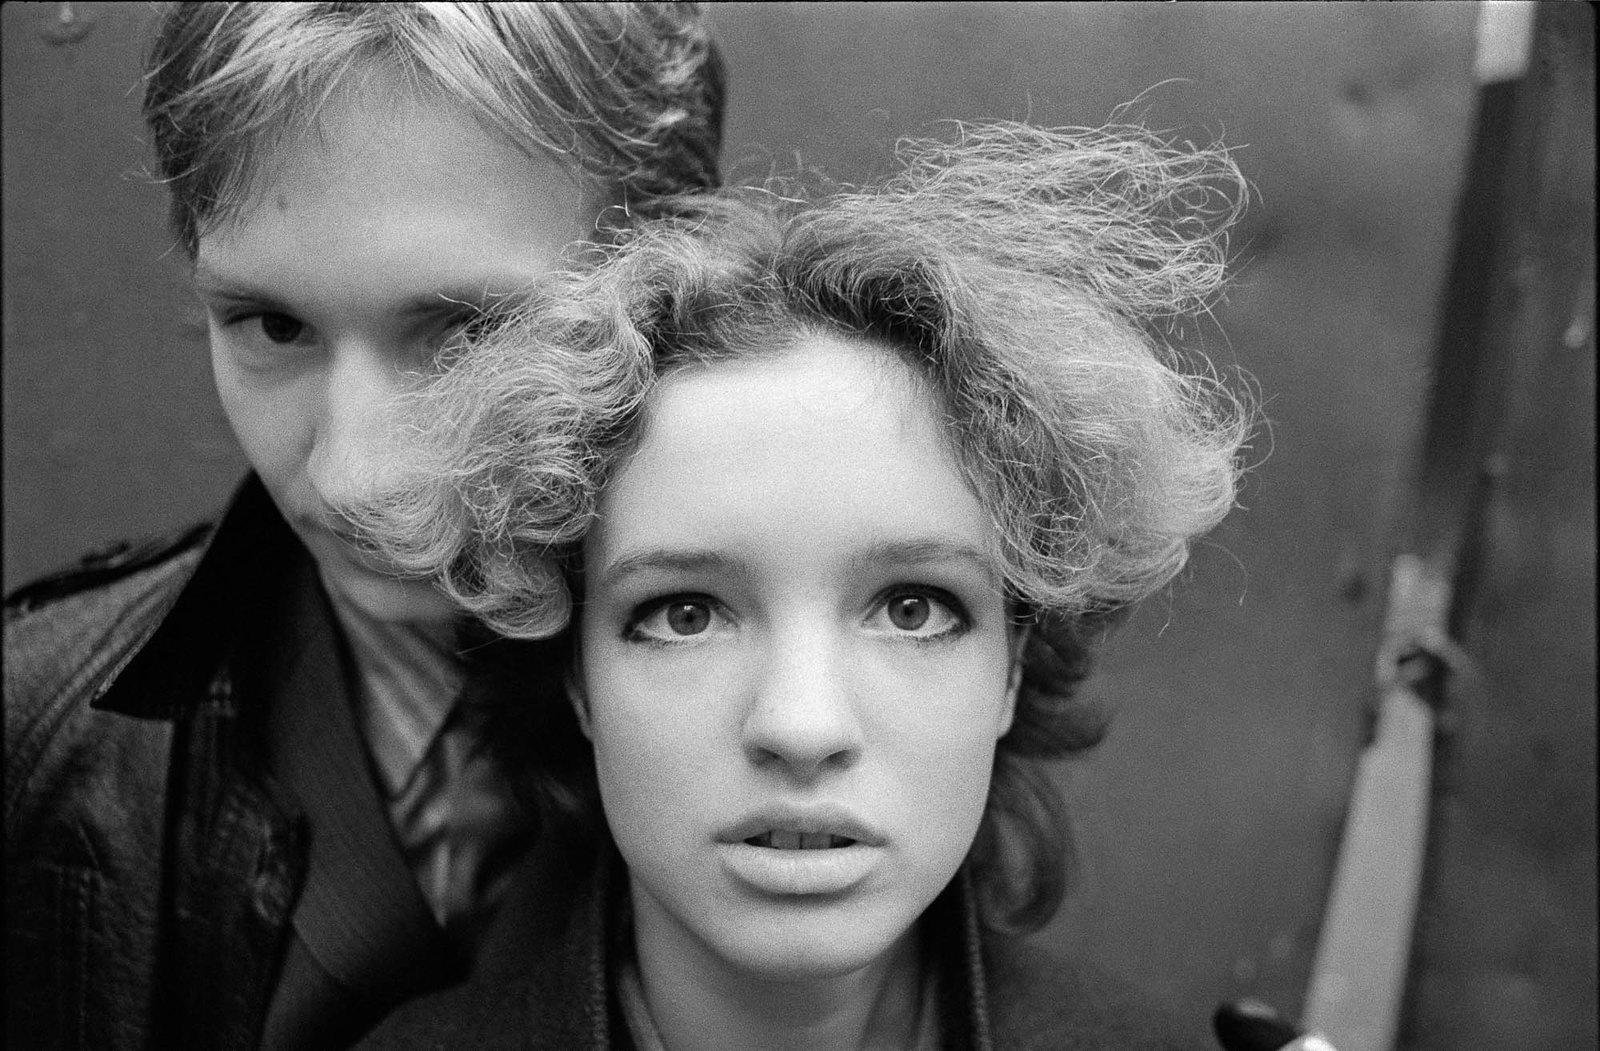 1987. Молодежь большого города